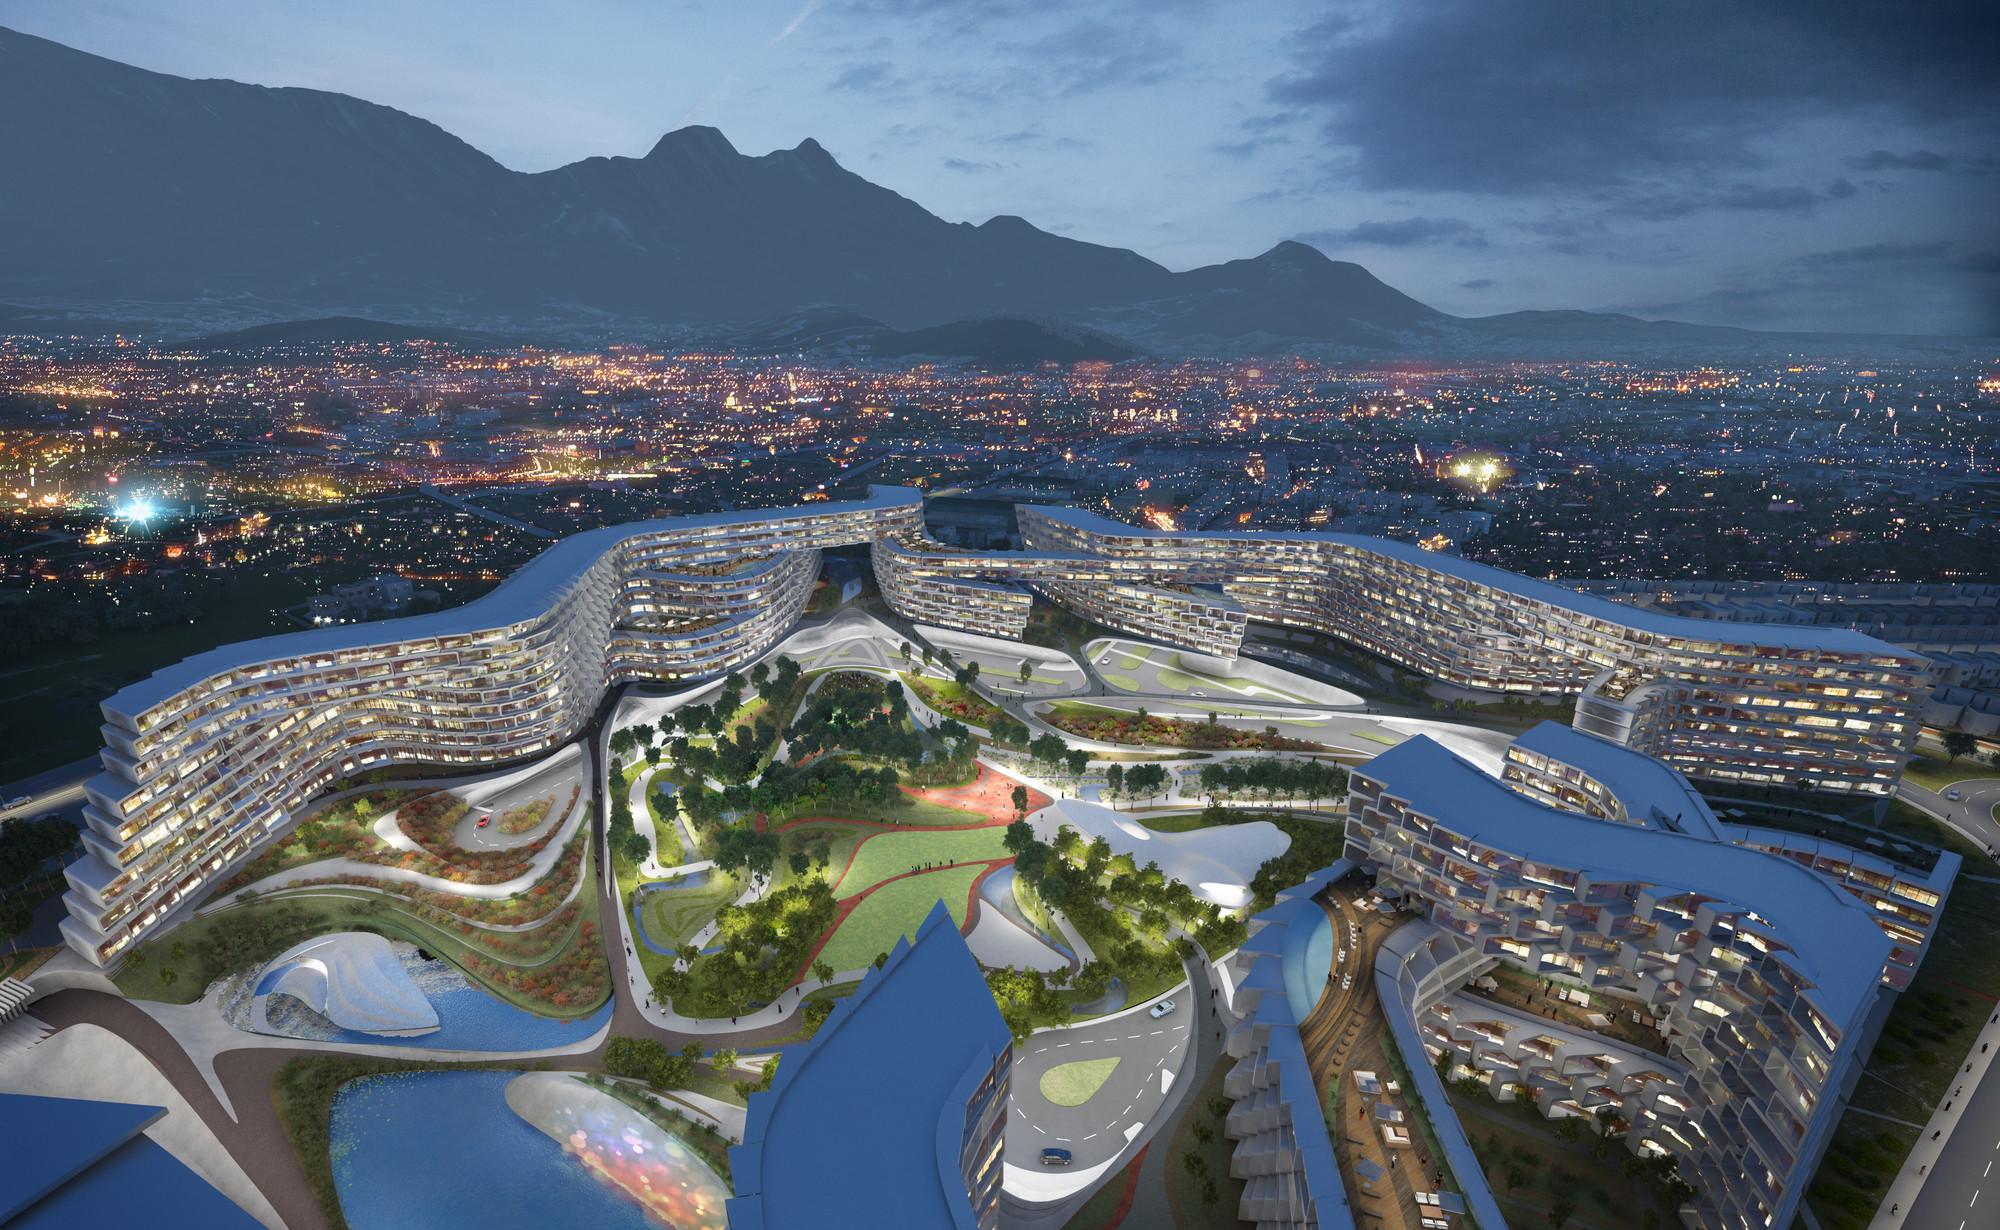 Zaha hadid divulga projeto de habita o em monterrey for Project planner hd